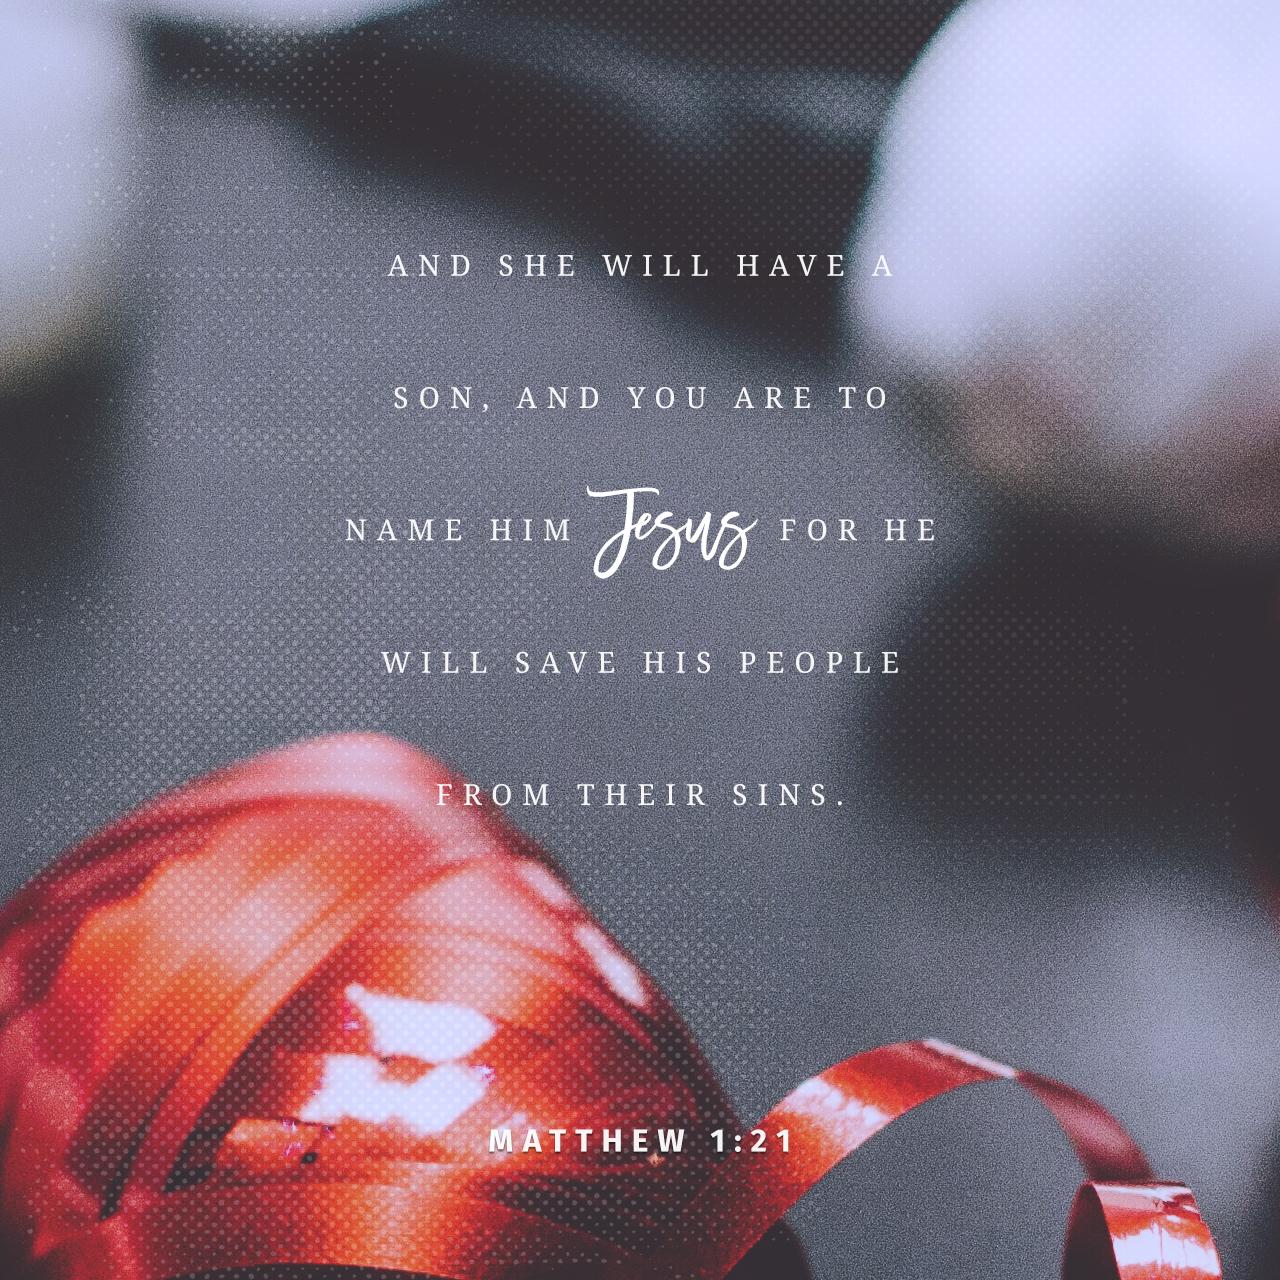 Matthew 1:21 (JPG)